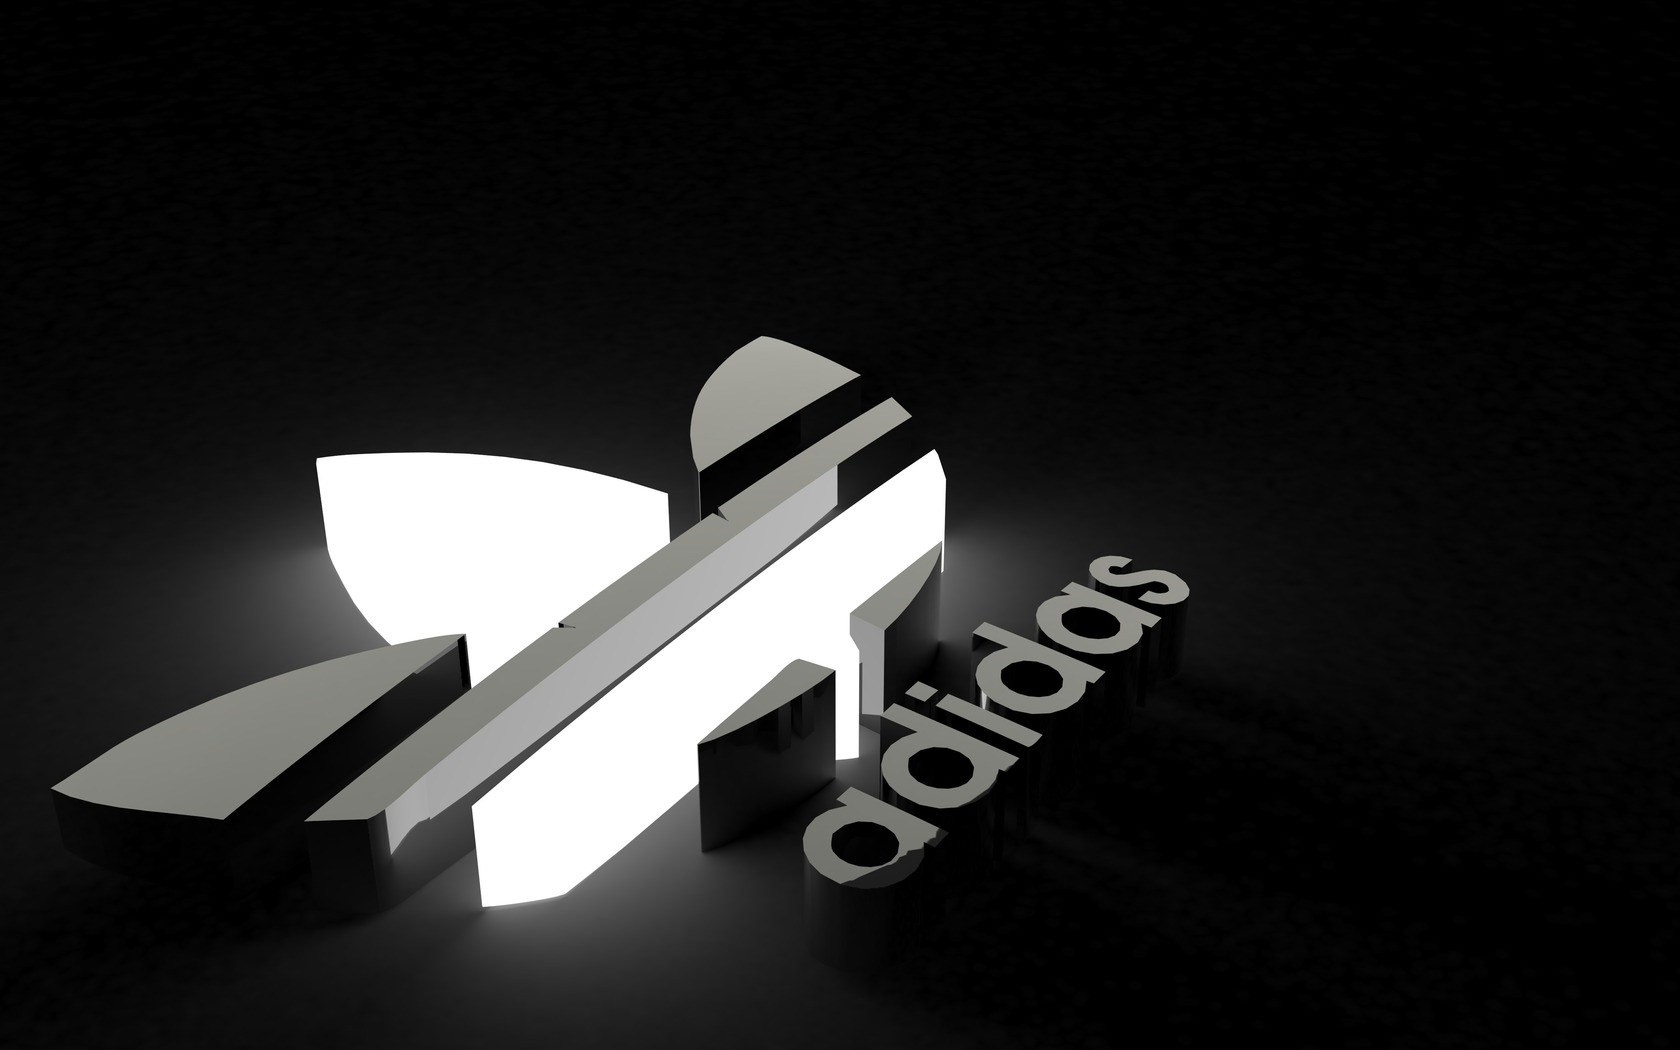 adidas logo hd wallpaper adidas logo hd wallpaper gallery 1680x1050